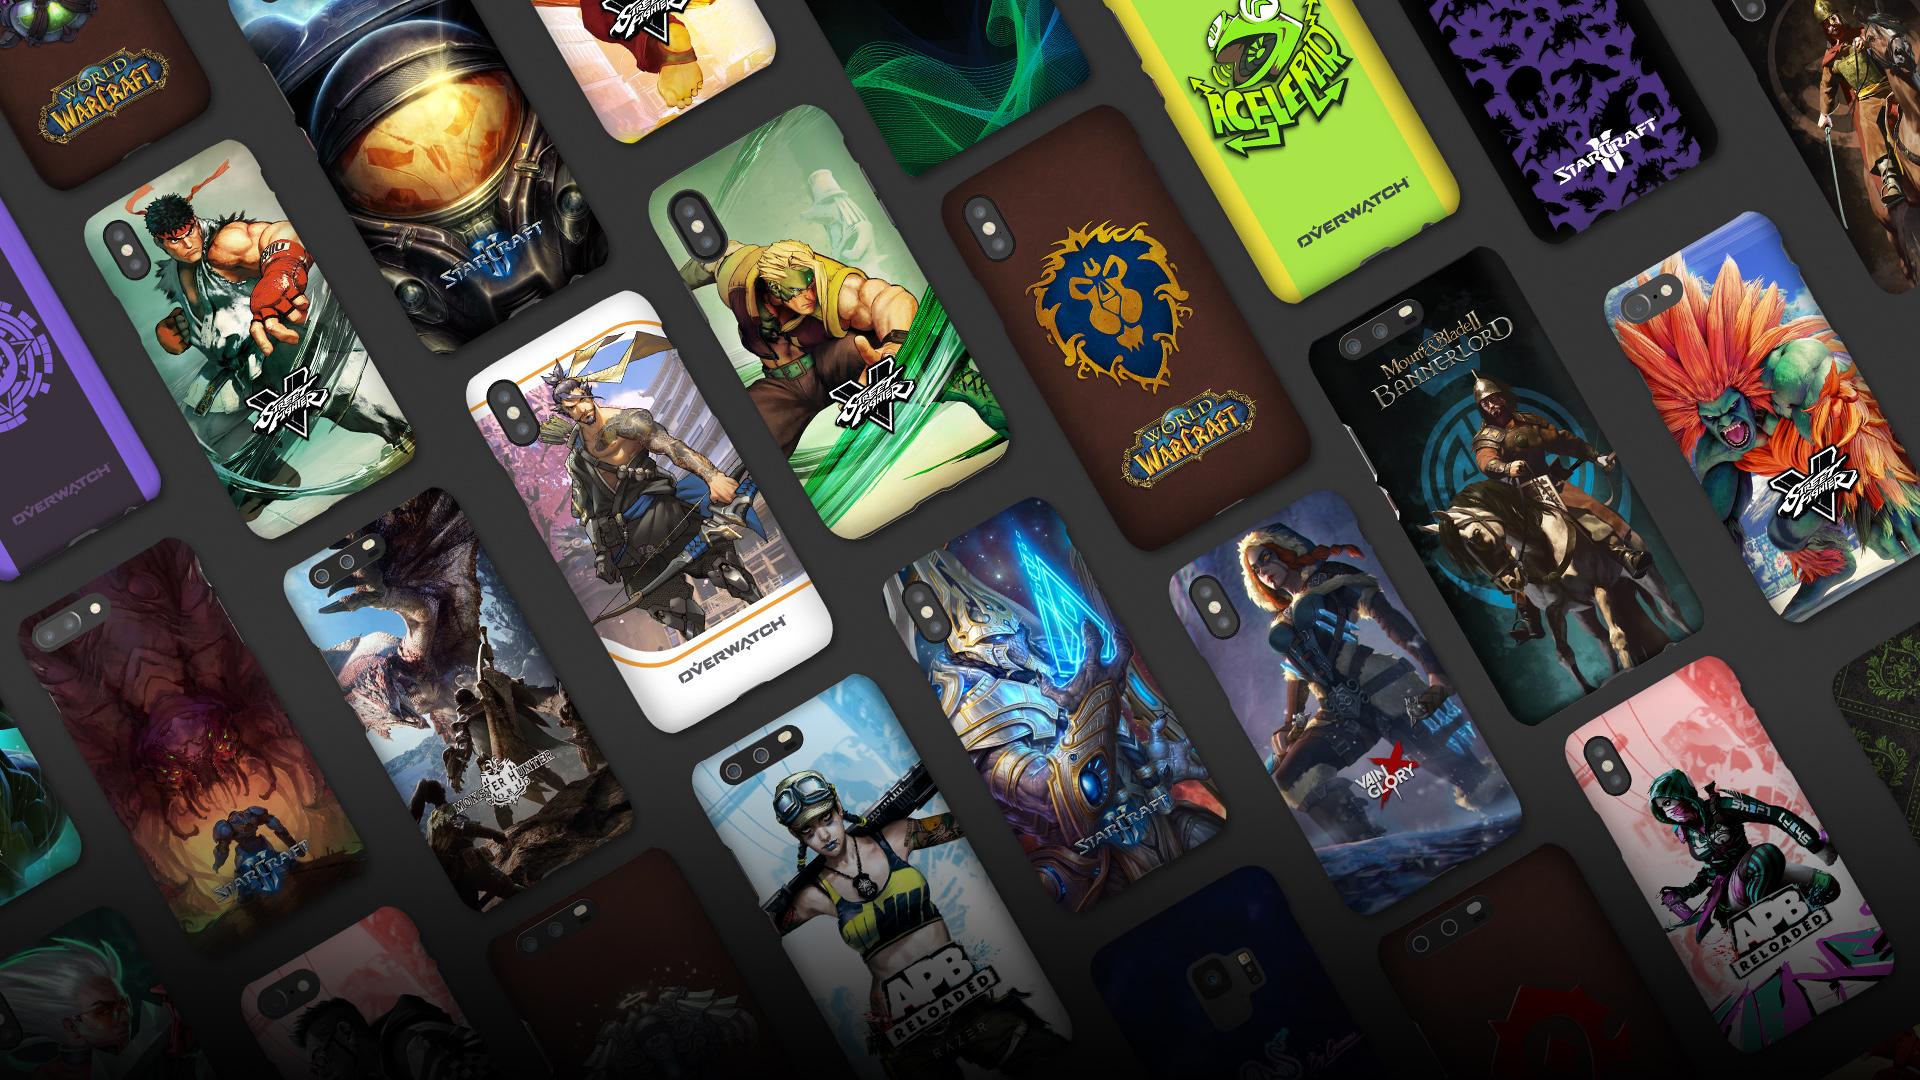 Razer Custom Phone Cases 1920x1080 Wallpaper Teahub Io